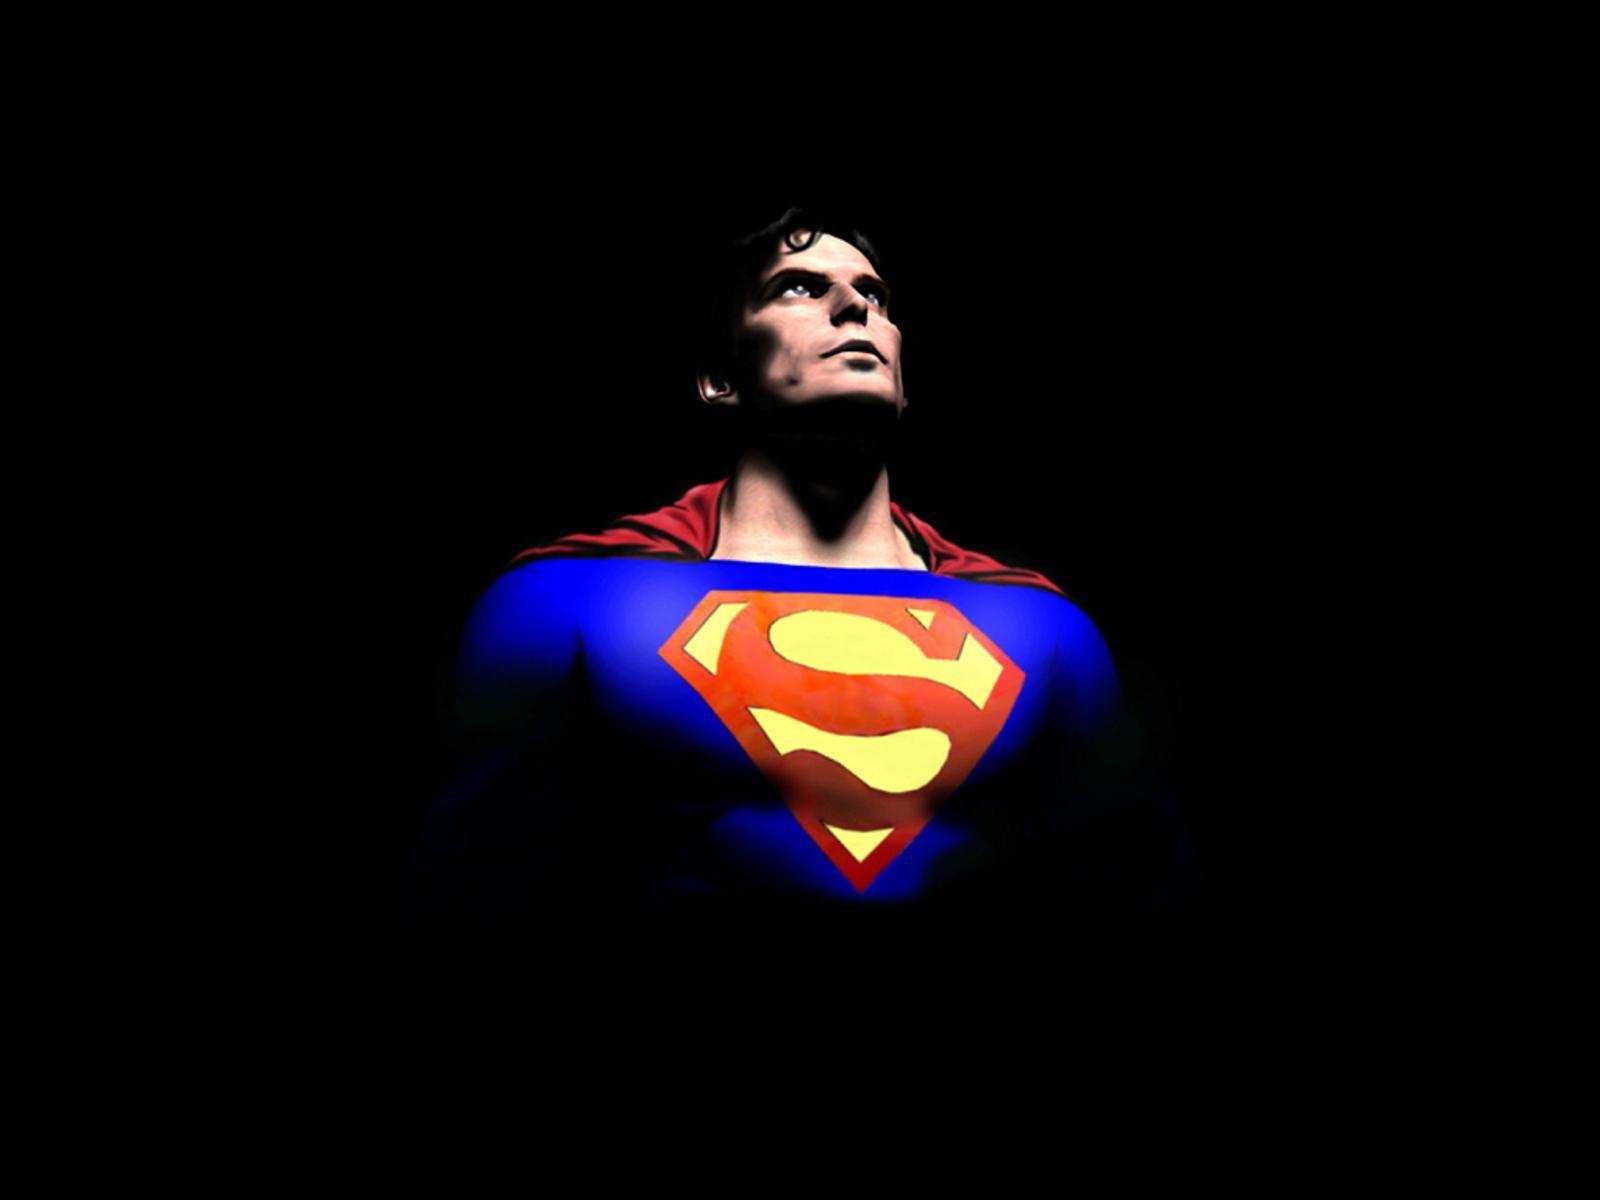 Hd wallpaper superman -  Hd Wallpaper Superman